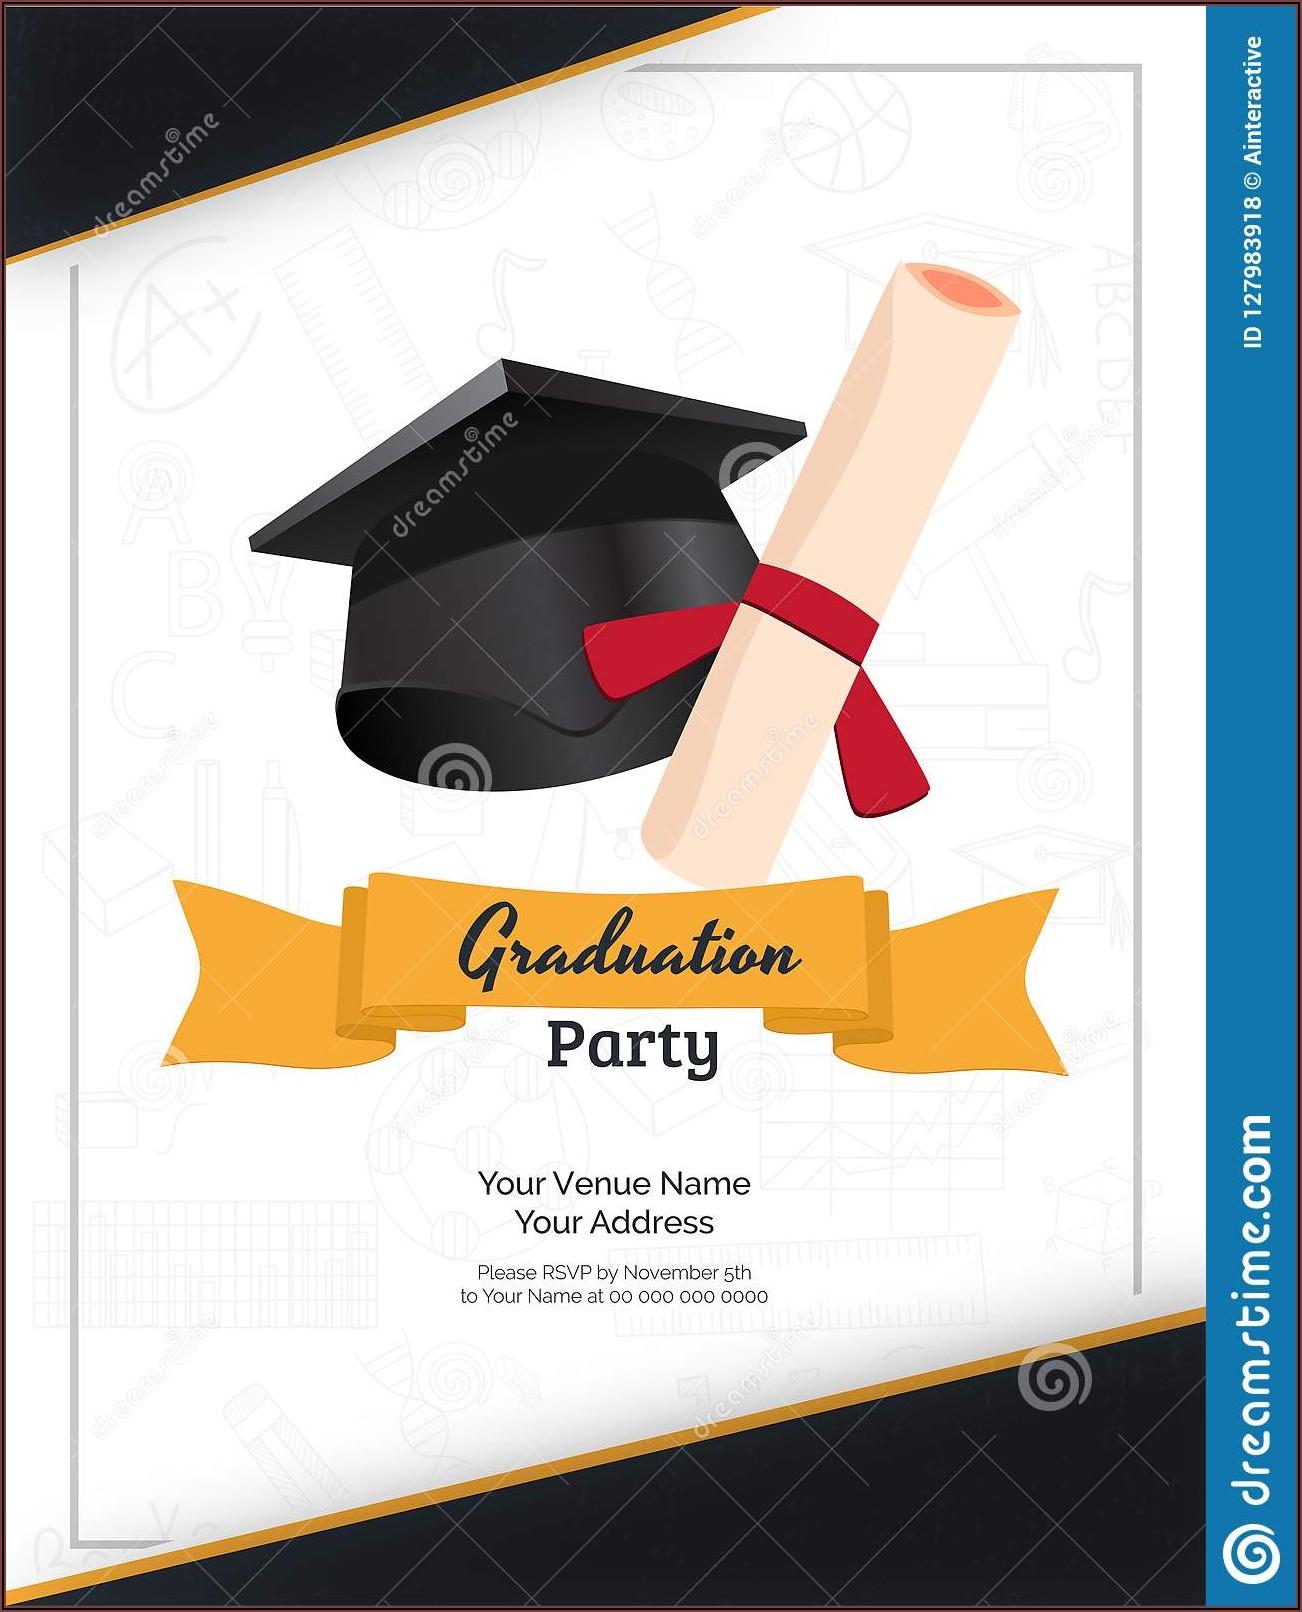 Graduation Day Invitation Design Templates